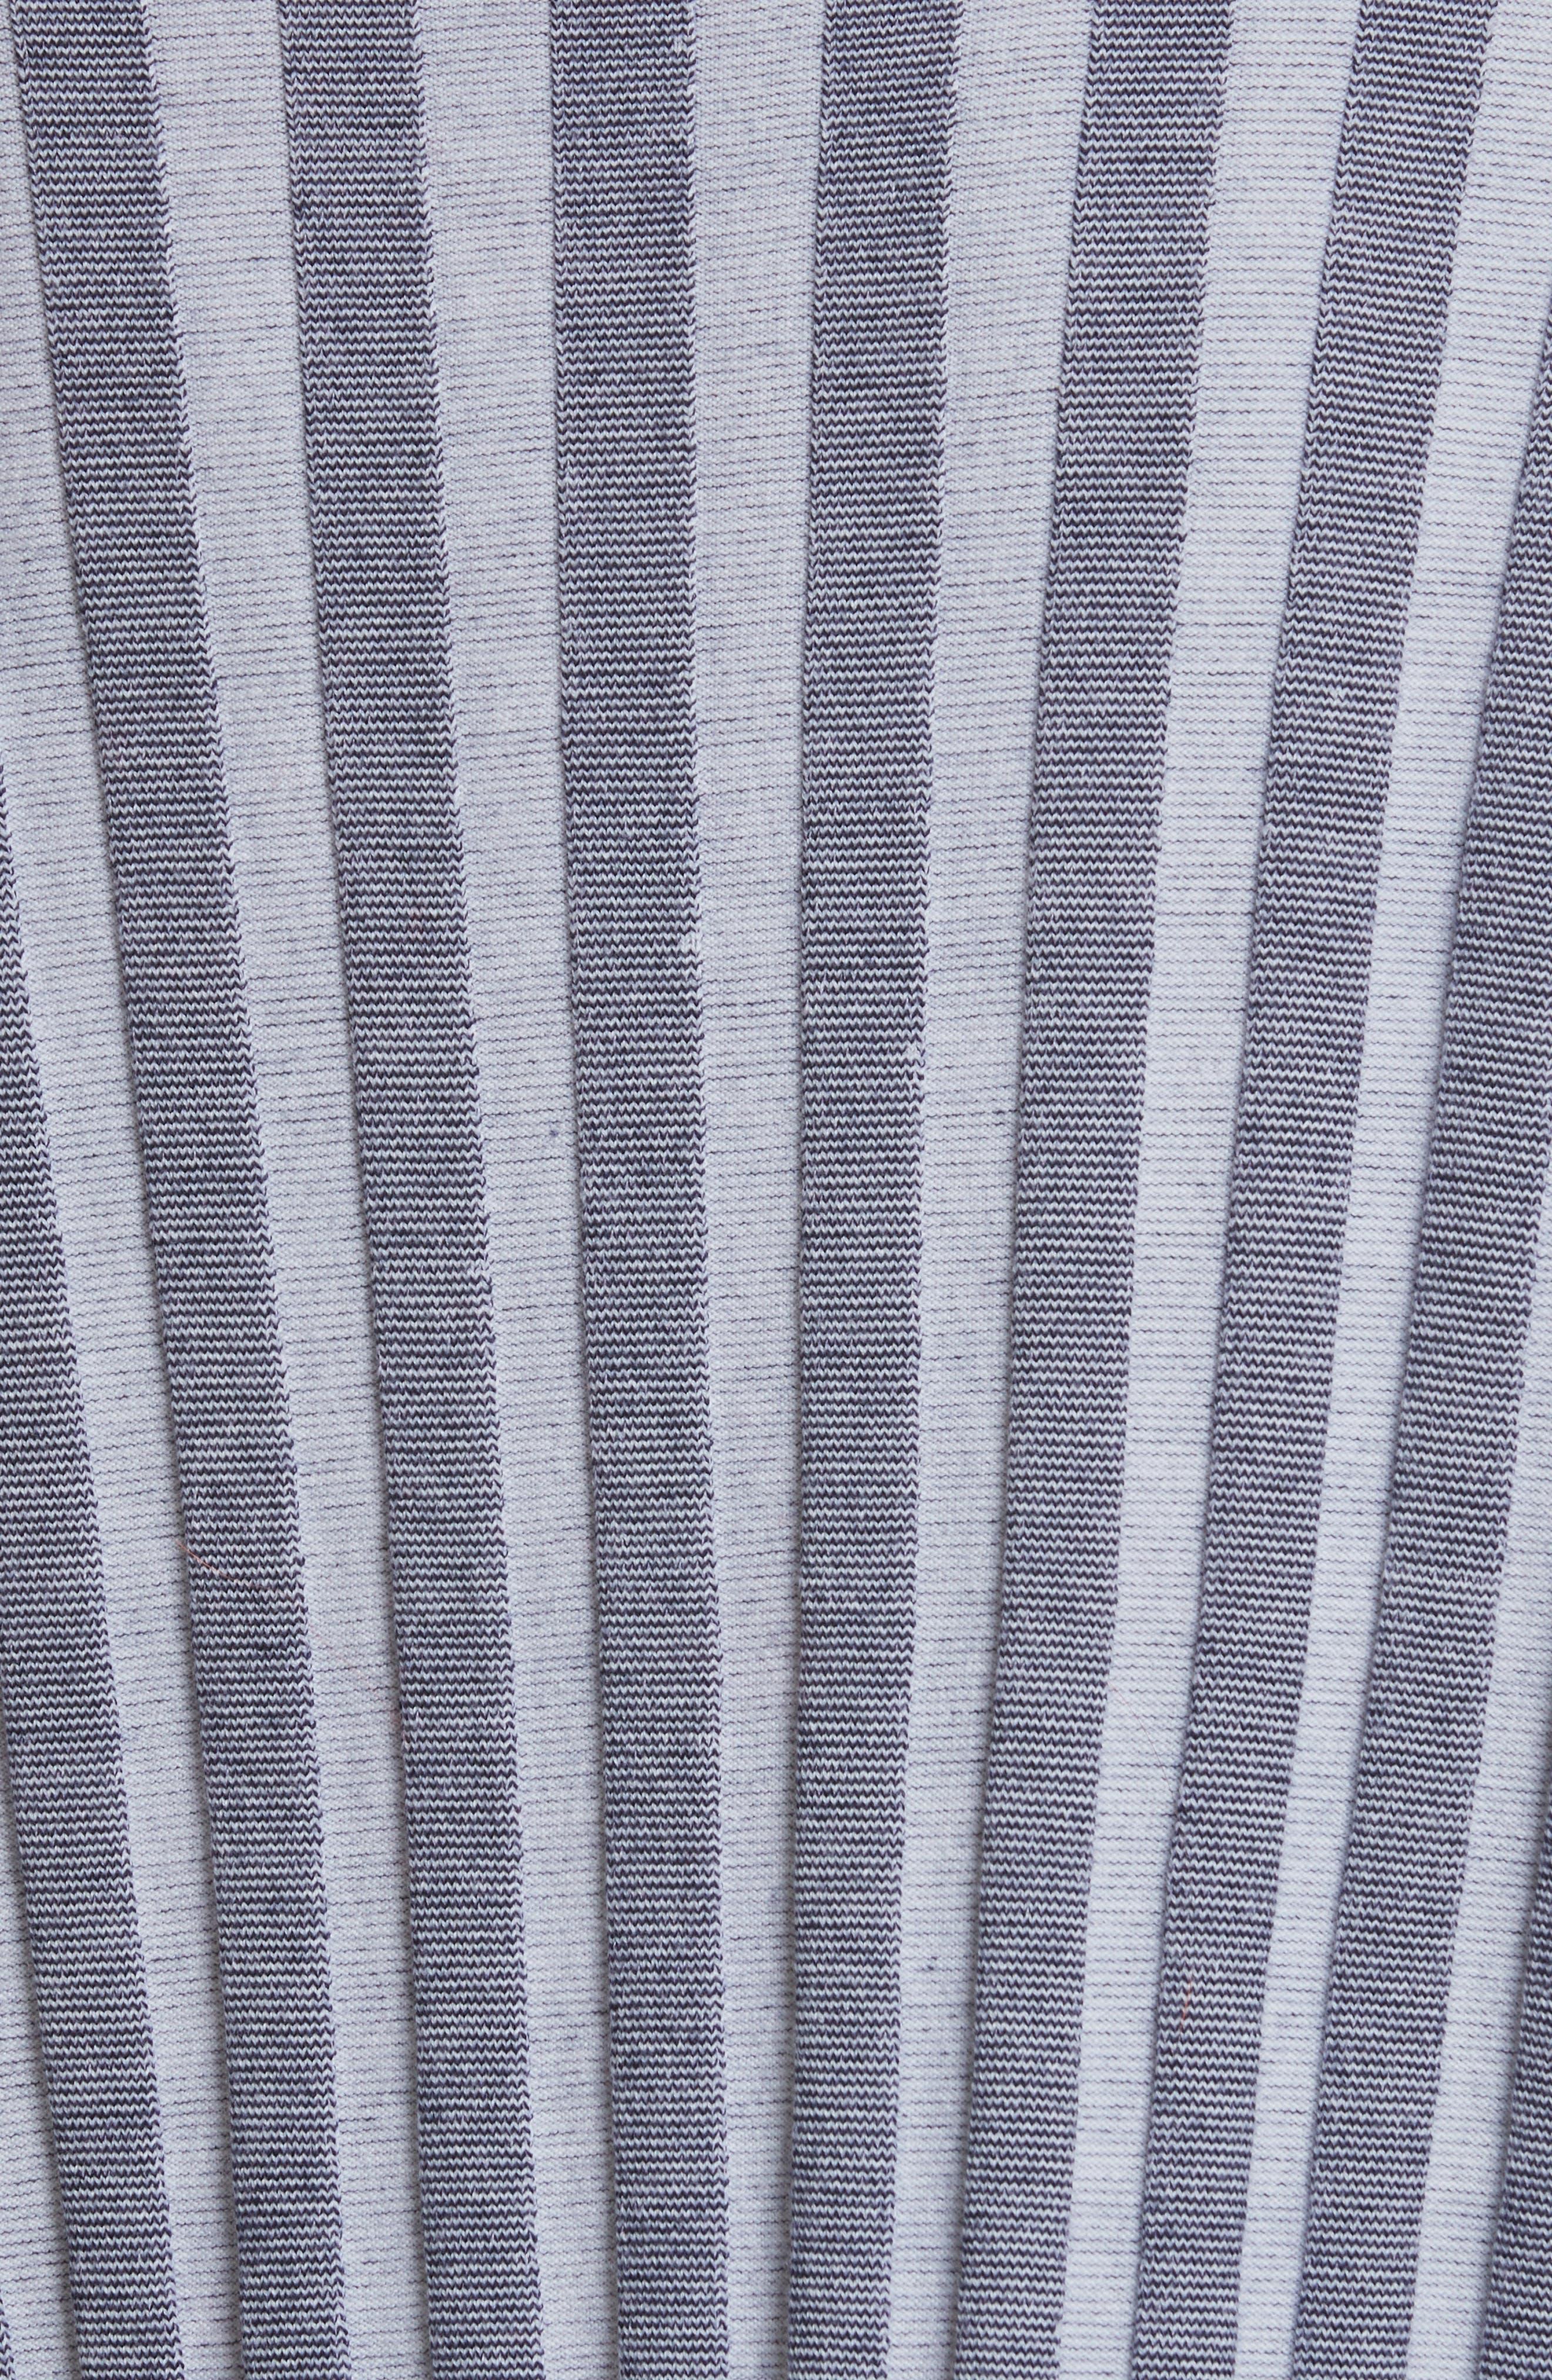 Campbell Stripe Merino Wool Blend Sweater,                             Alternate thumbnail 5, color,                             Navy/ Ivory